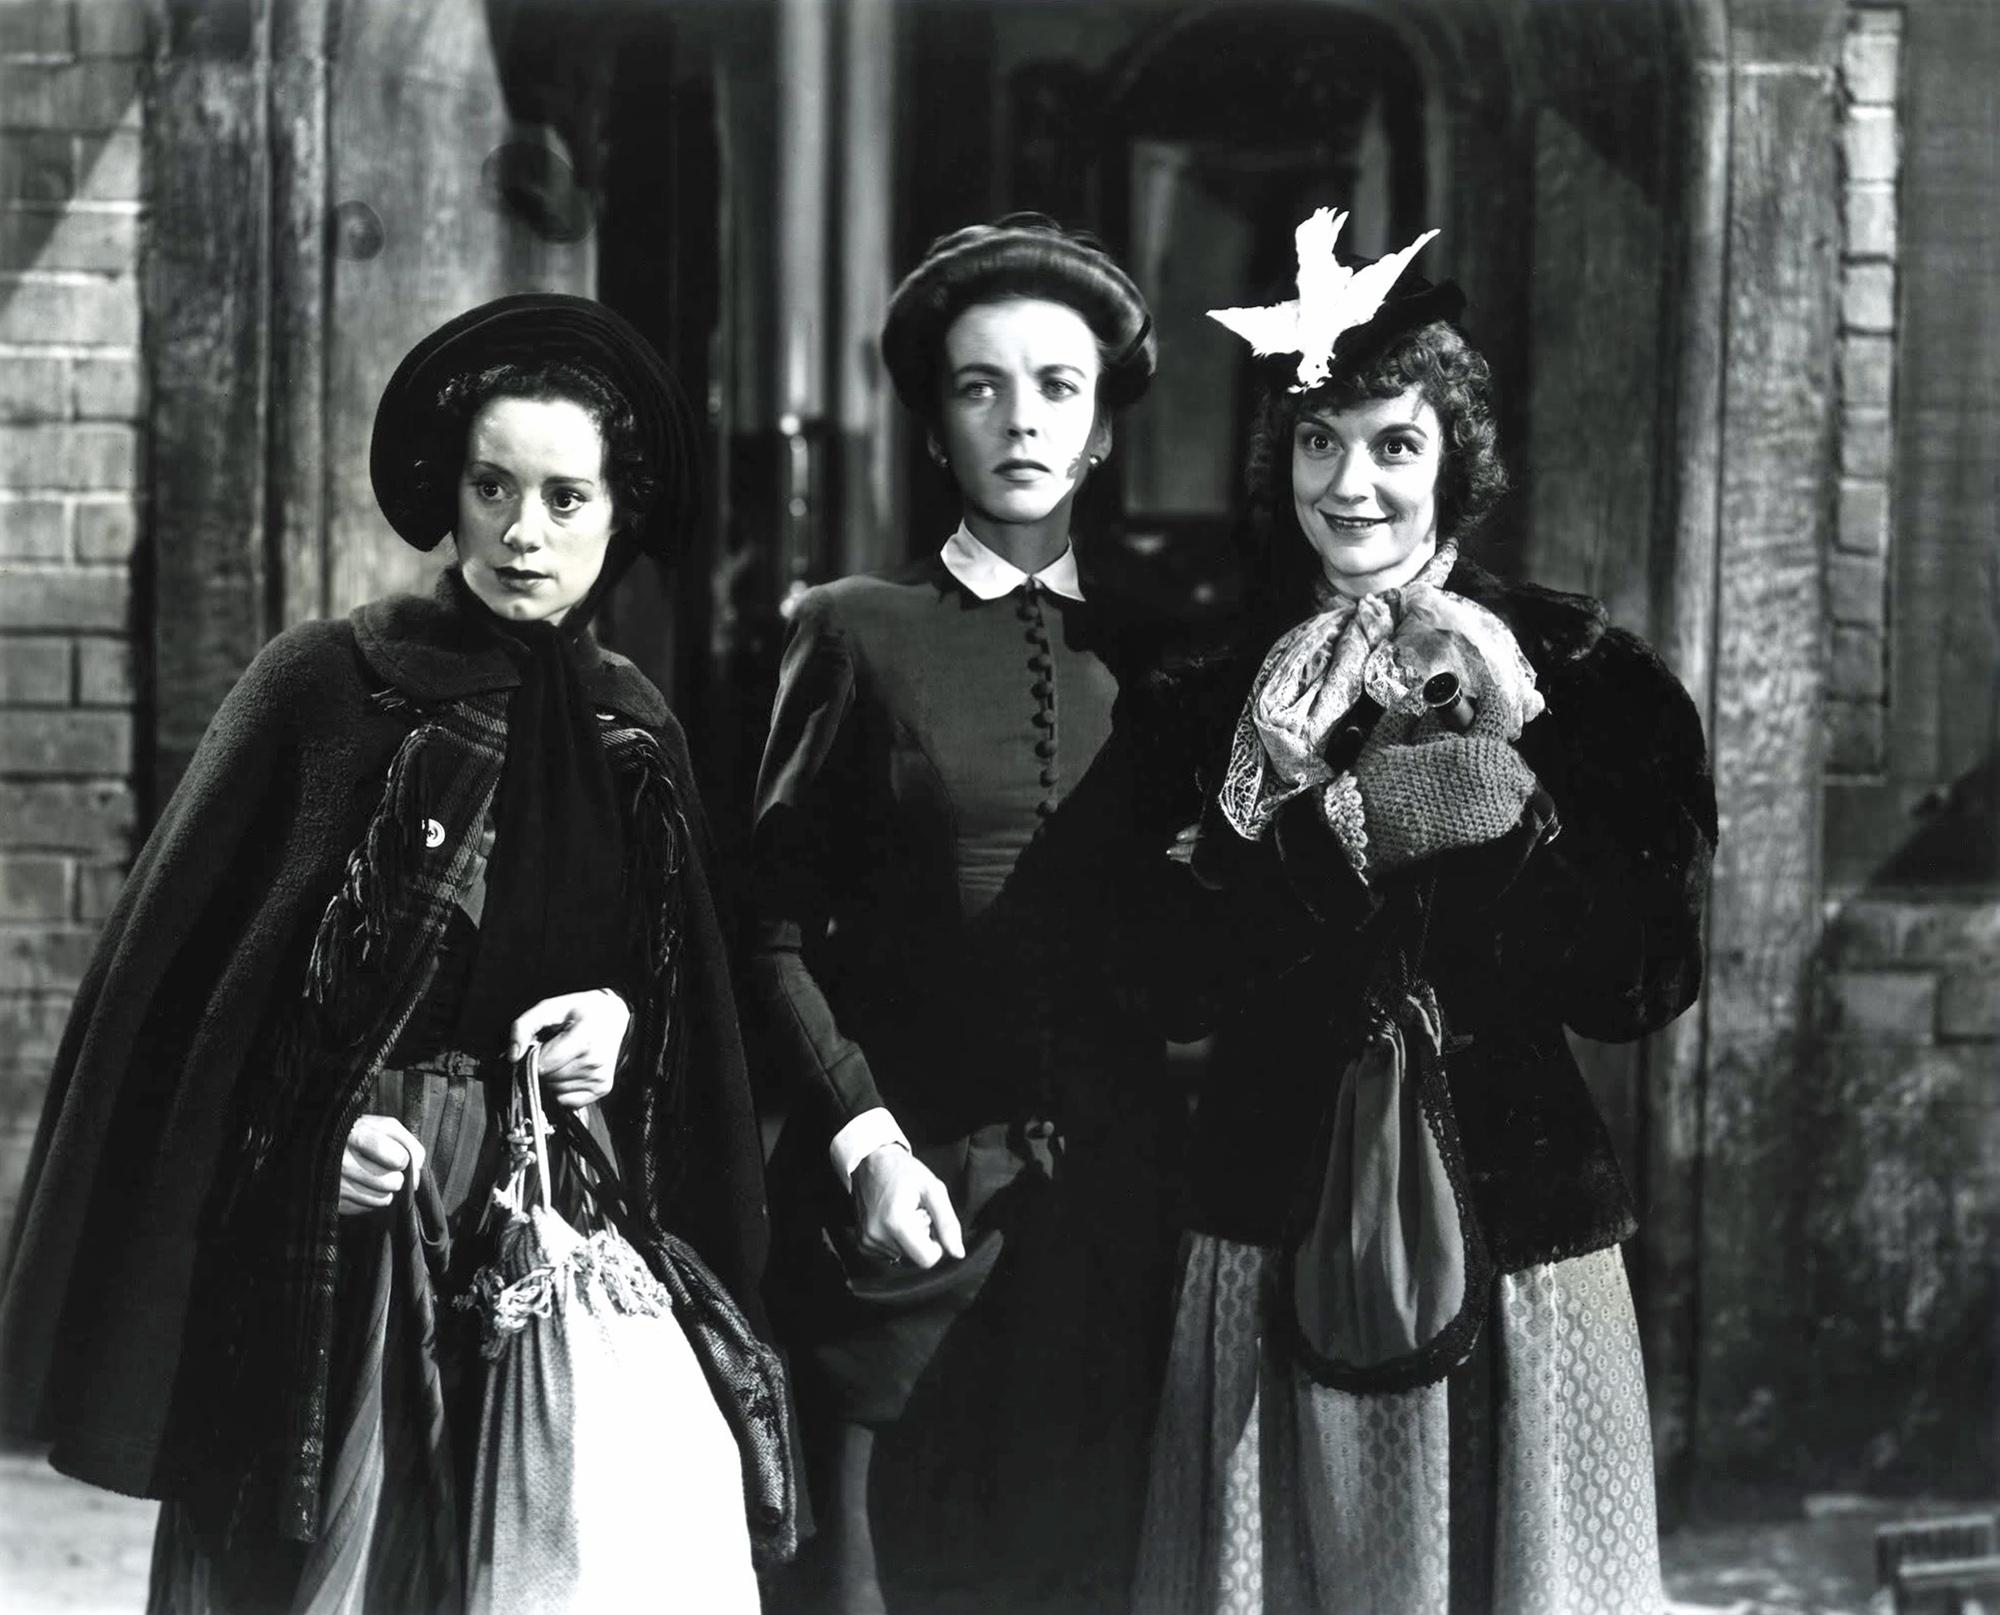 (L to R) Elsa Lanchester, Ida Lupino, Edith Barrett